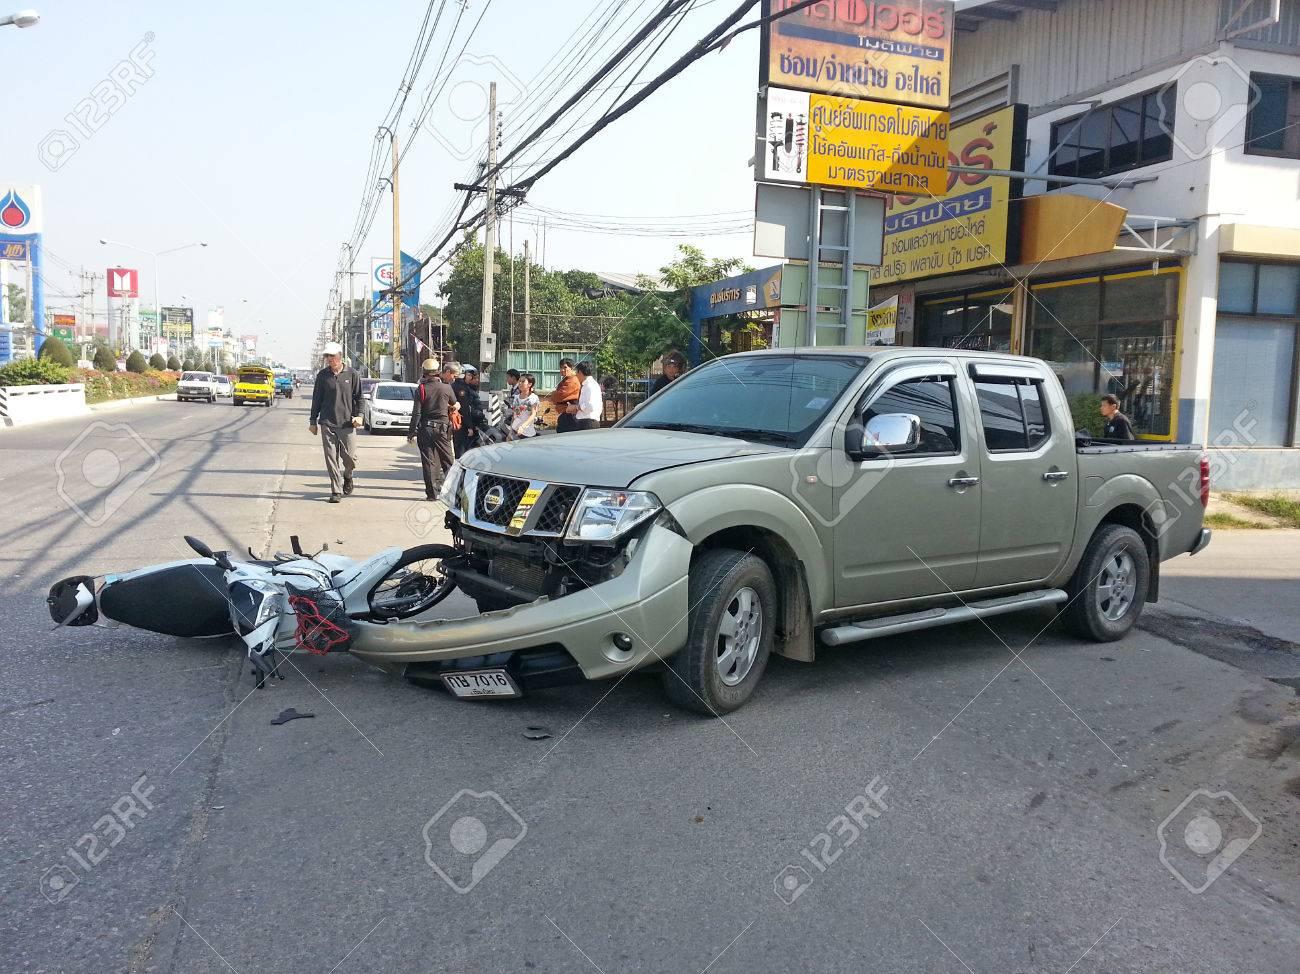 CHIANGMAI, THAILAND-JANUARY 10, 2013: Crash Accident Pickup Truck